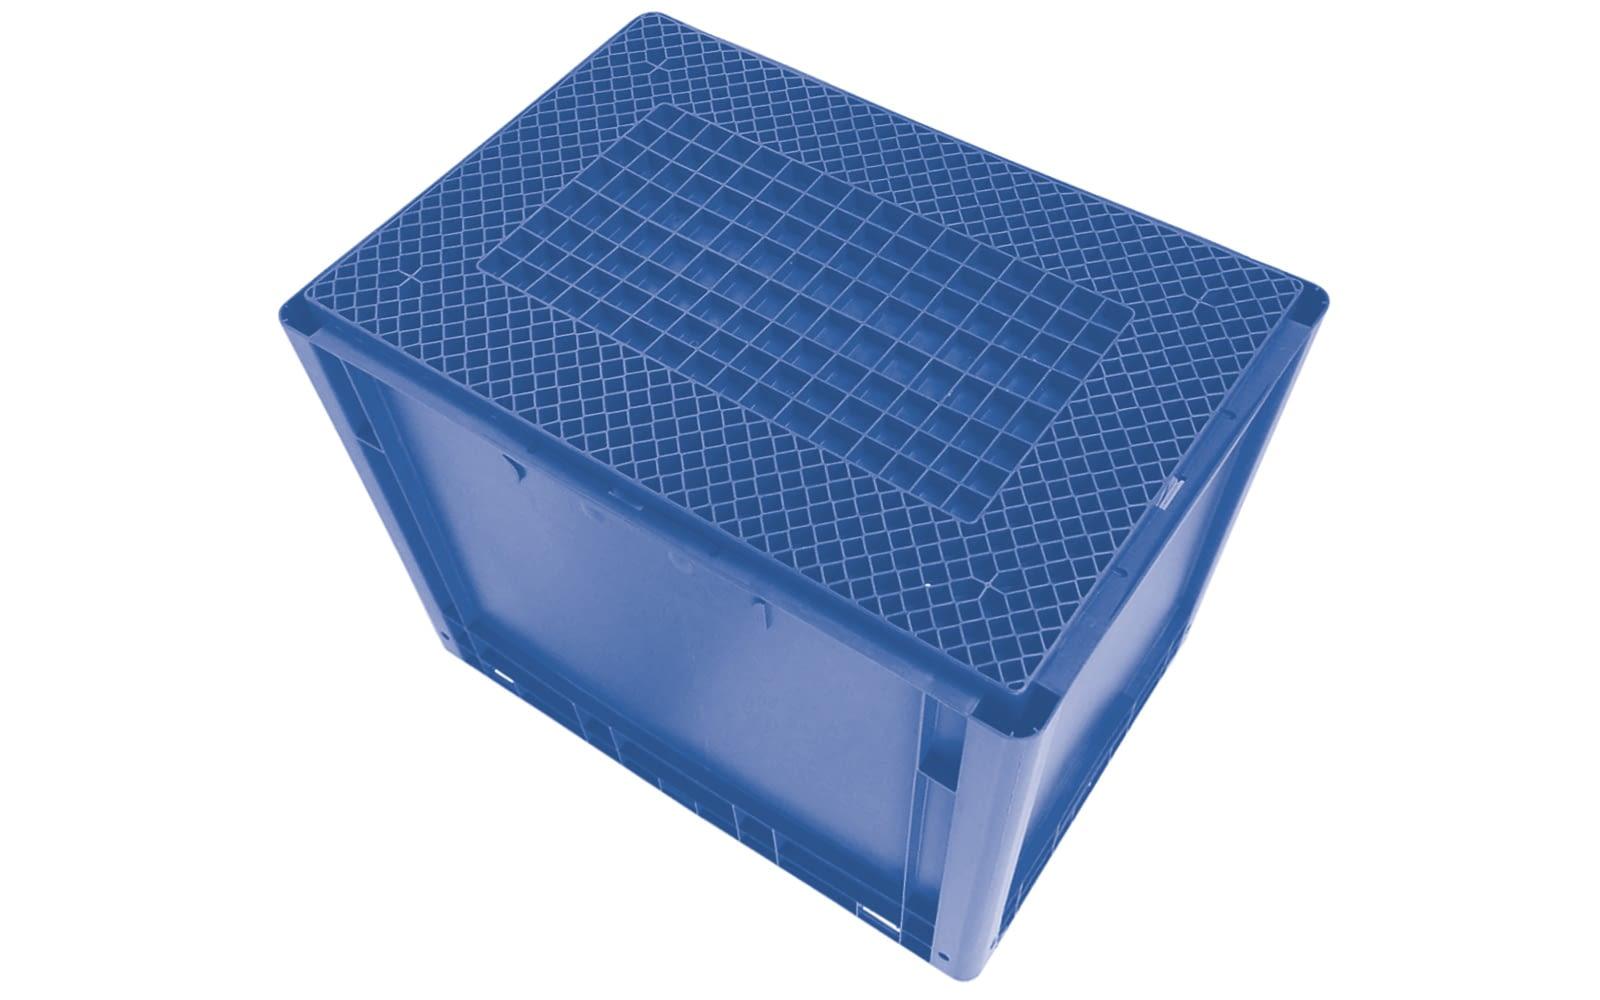 Eurostapelbehälter XL, Wände geschlossen, blau, IMG_21231